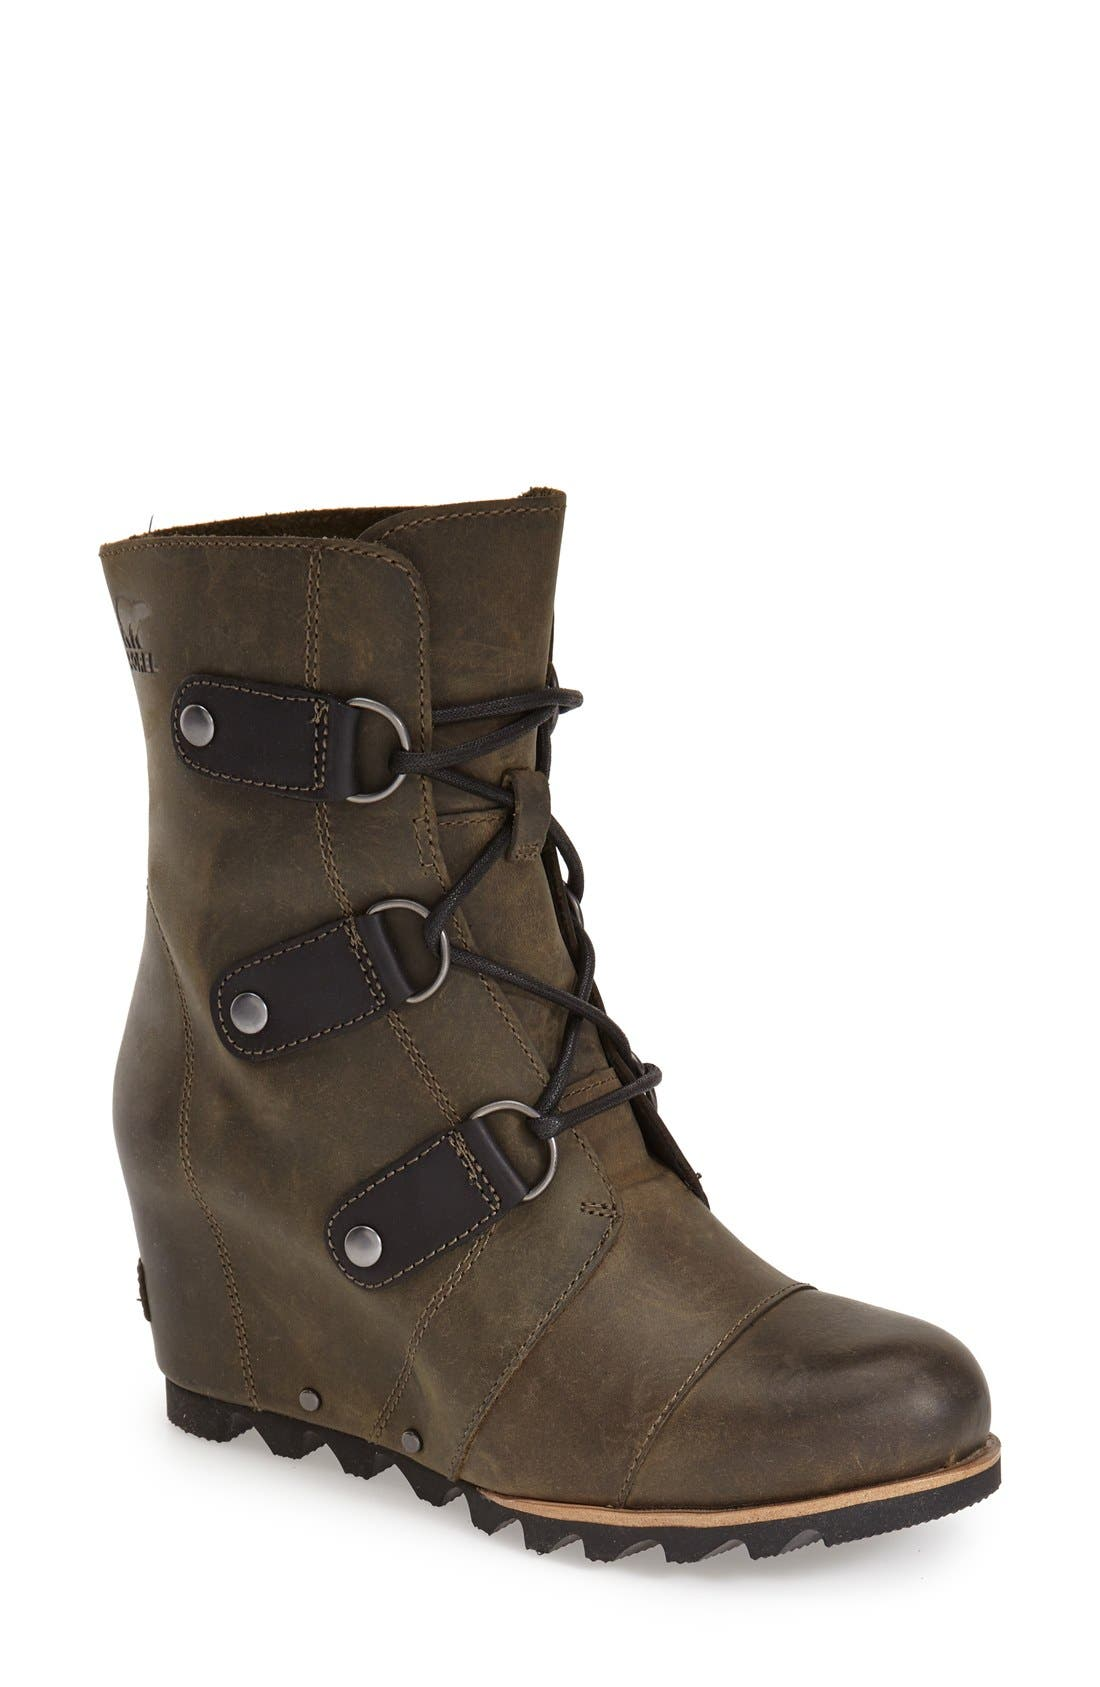 'Joan of Arctic' Waterproof Wedge Boot,                             Main thumbnail 1, color,                             Nori Green Leather